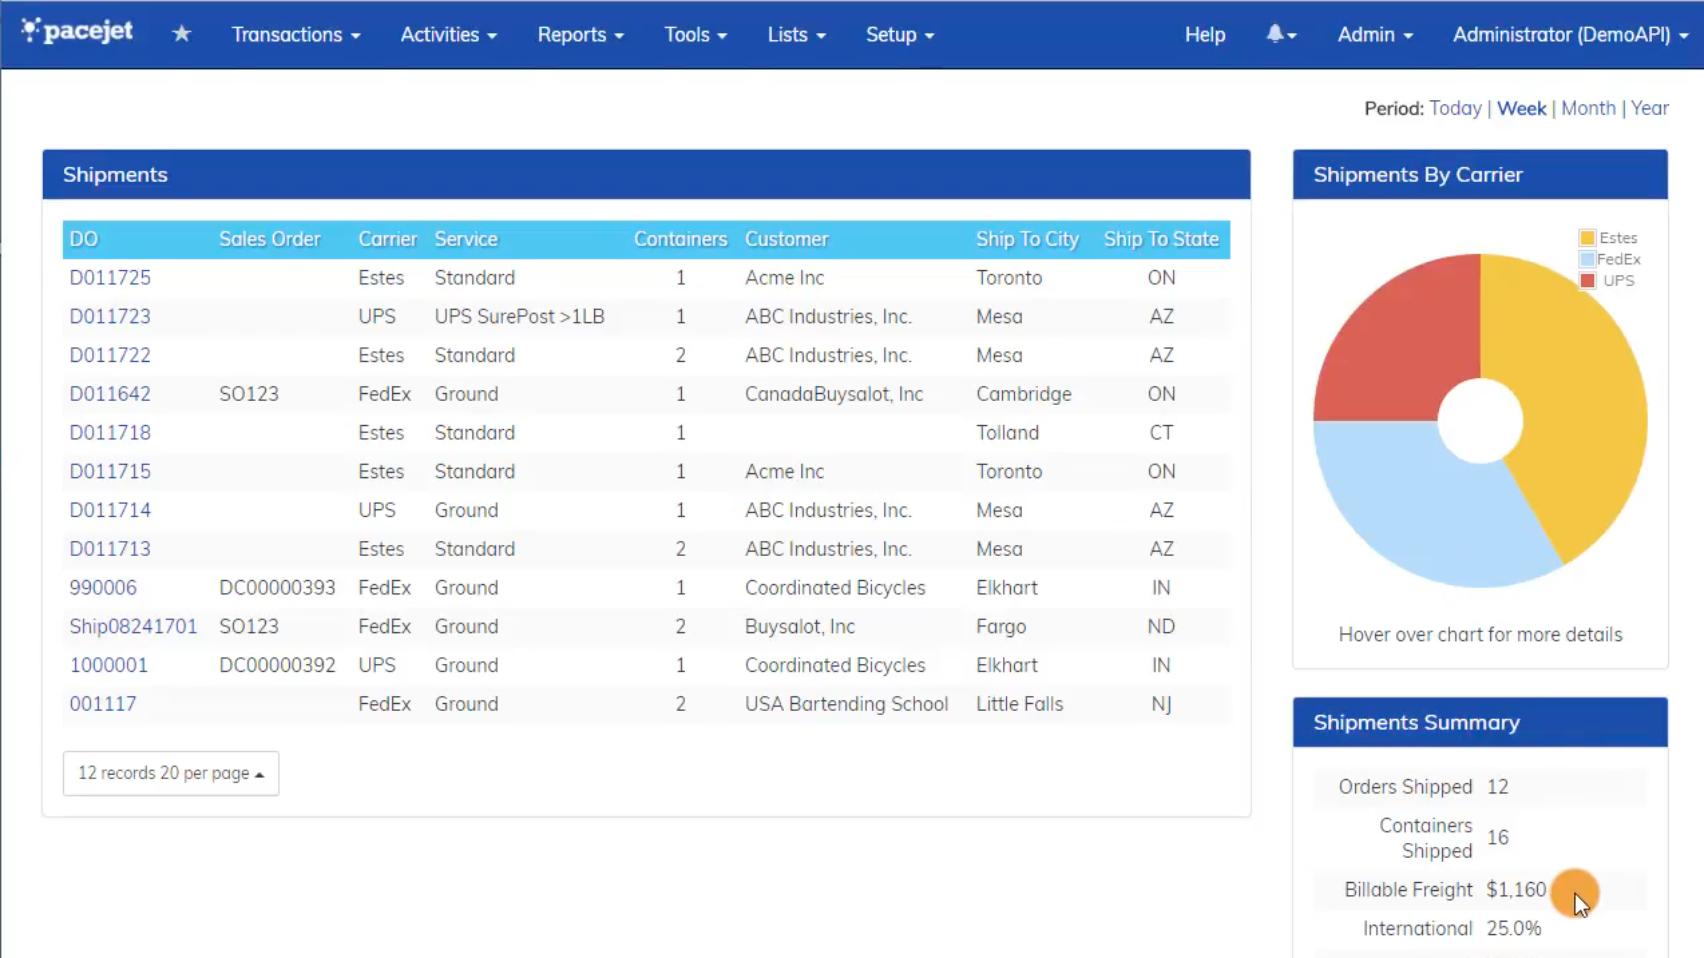 Pacejet screenshot: Shipments